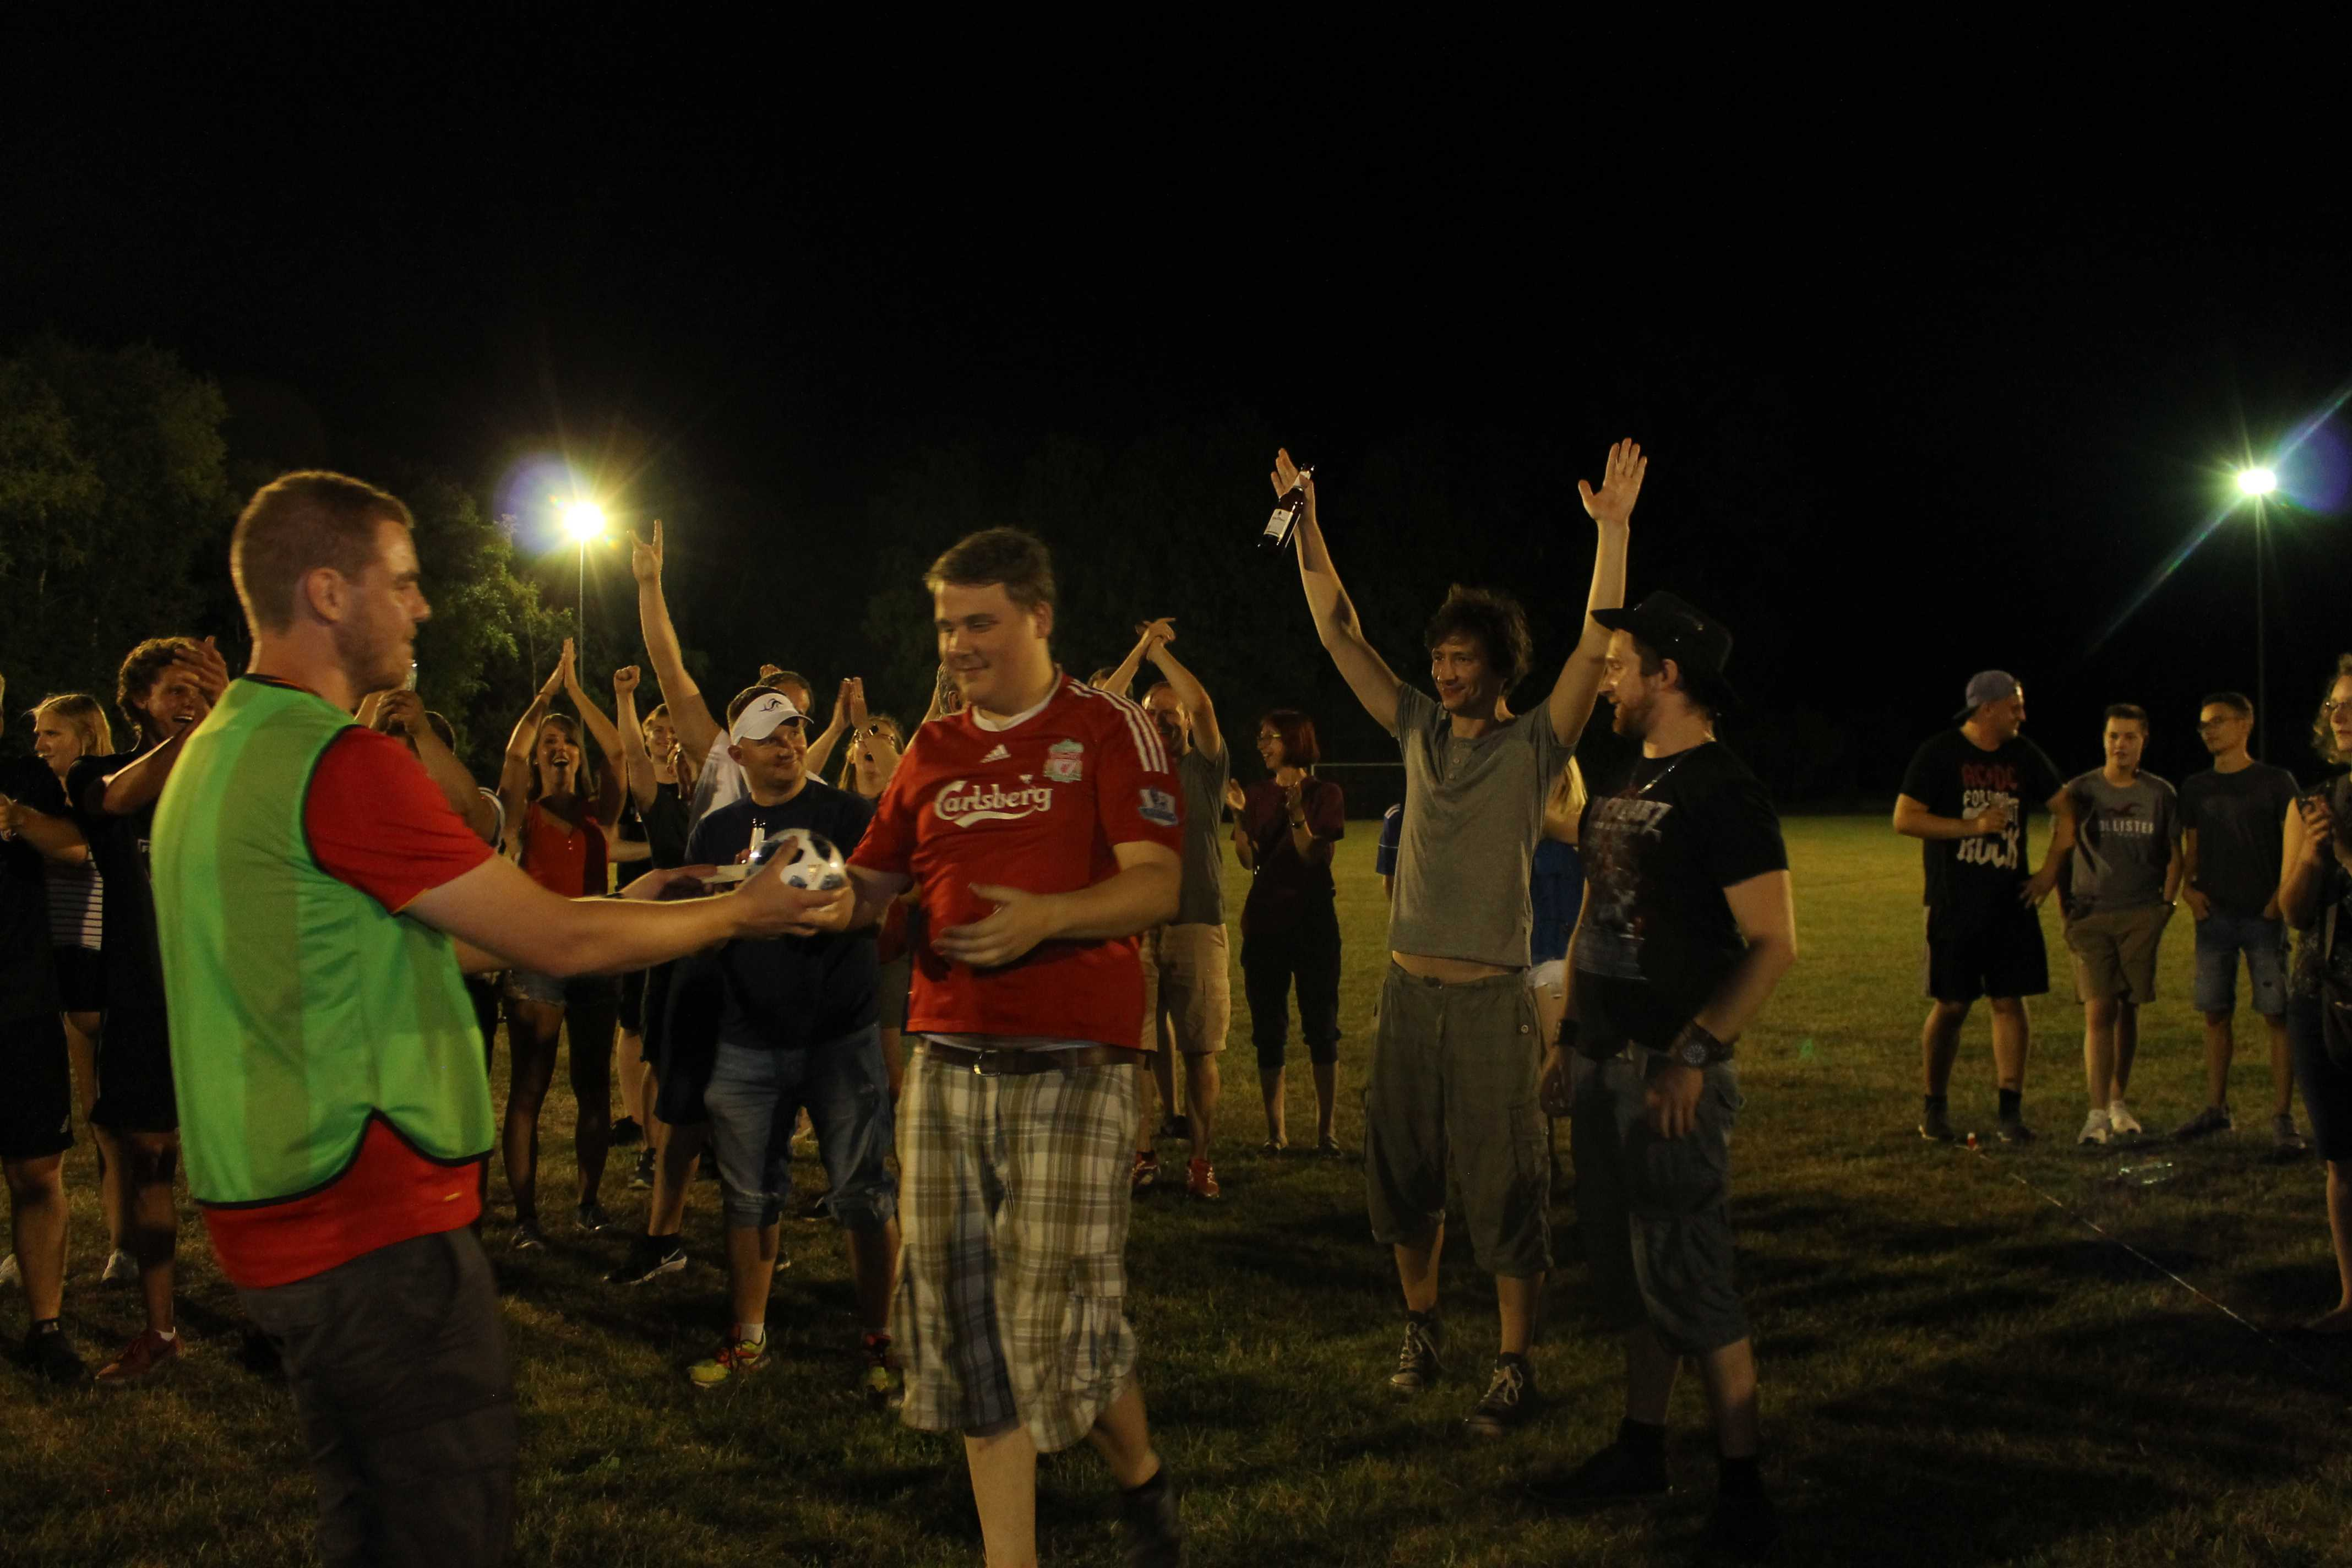 2018-07-27 Sportwoche - Flunkyball Turnier (93)